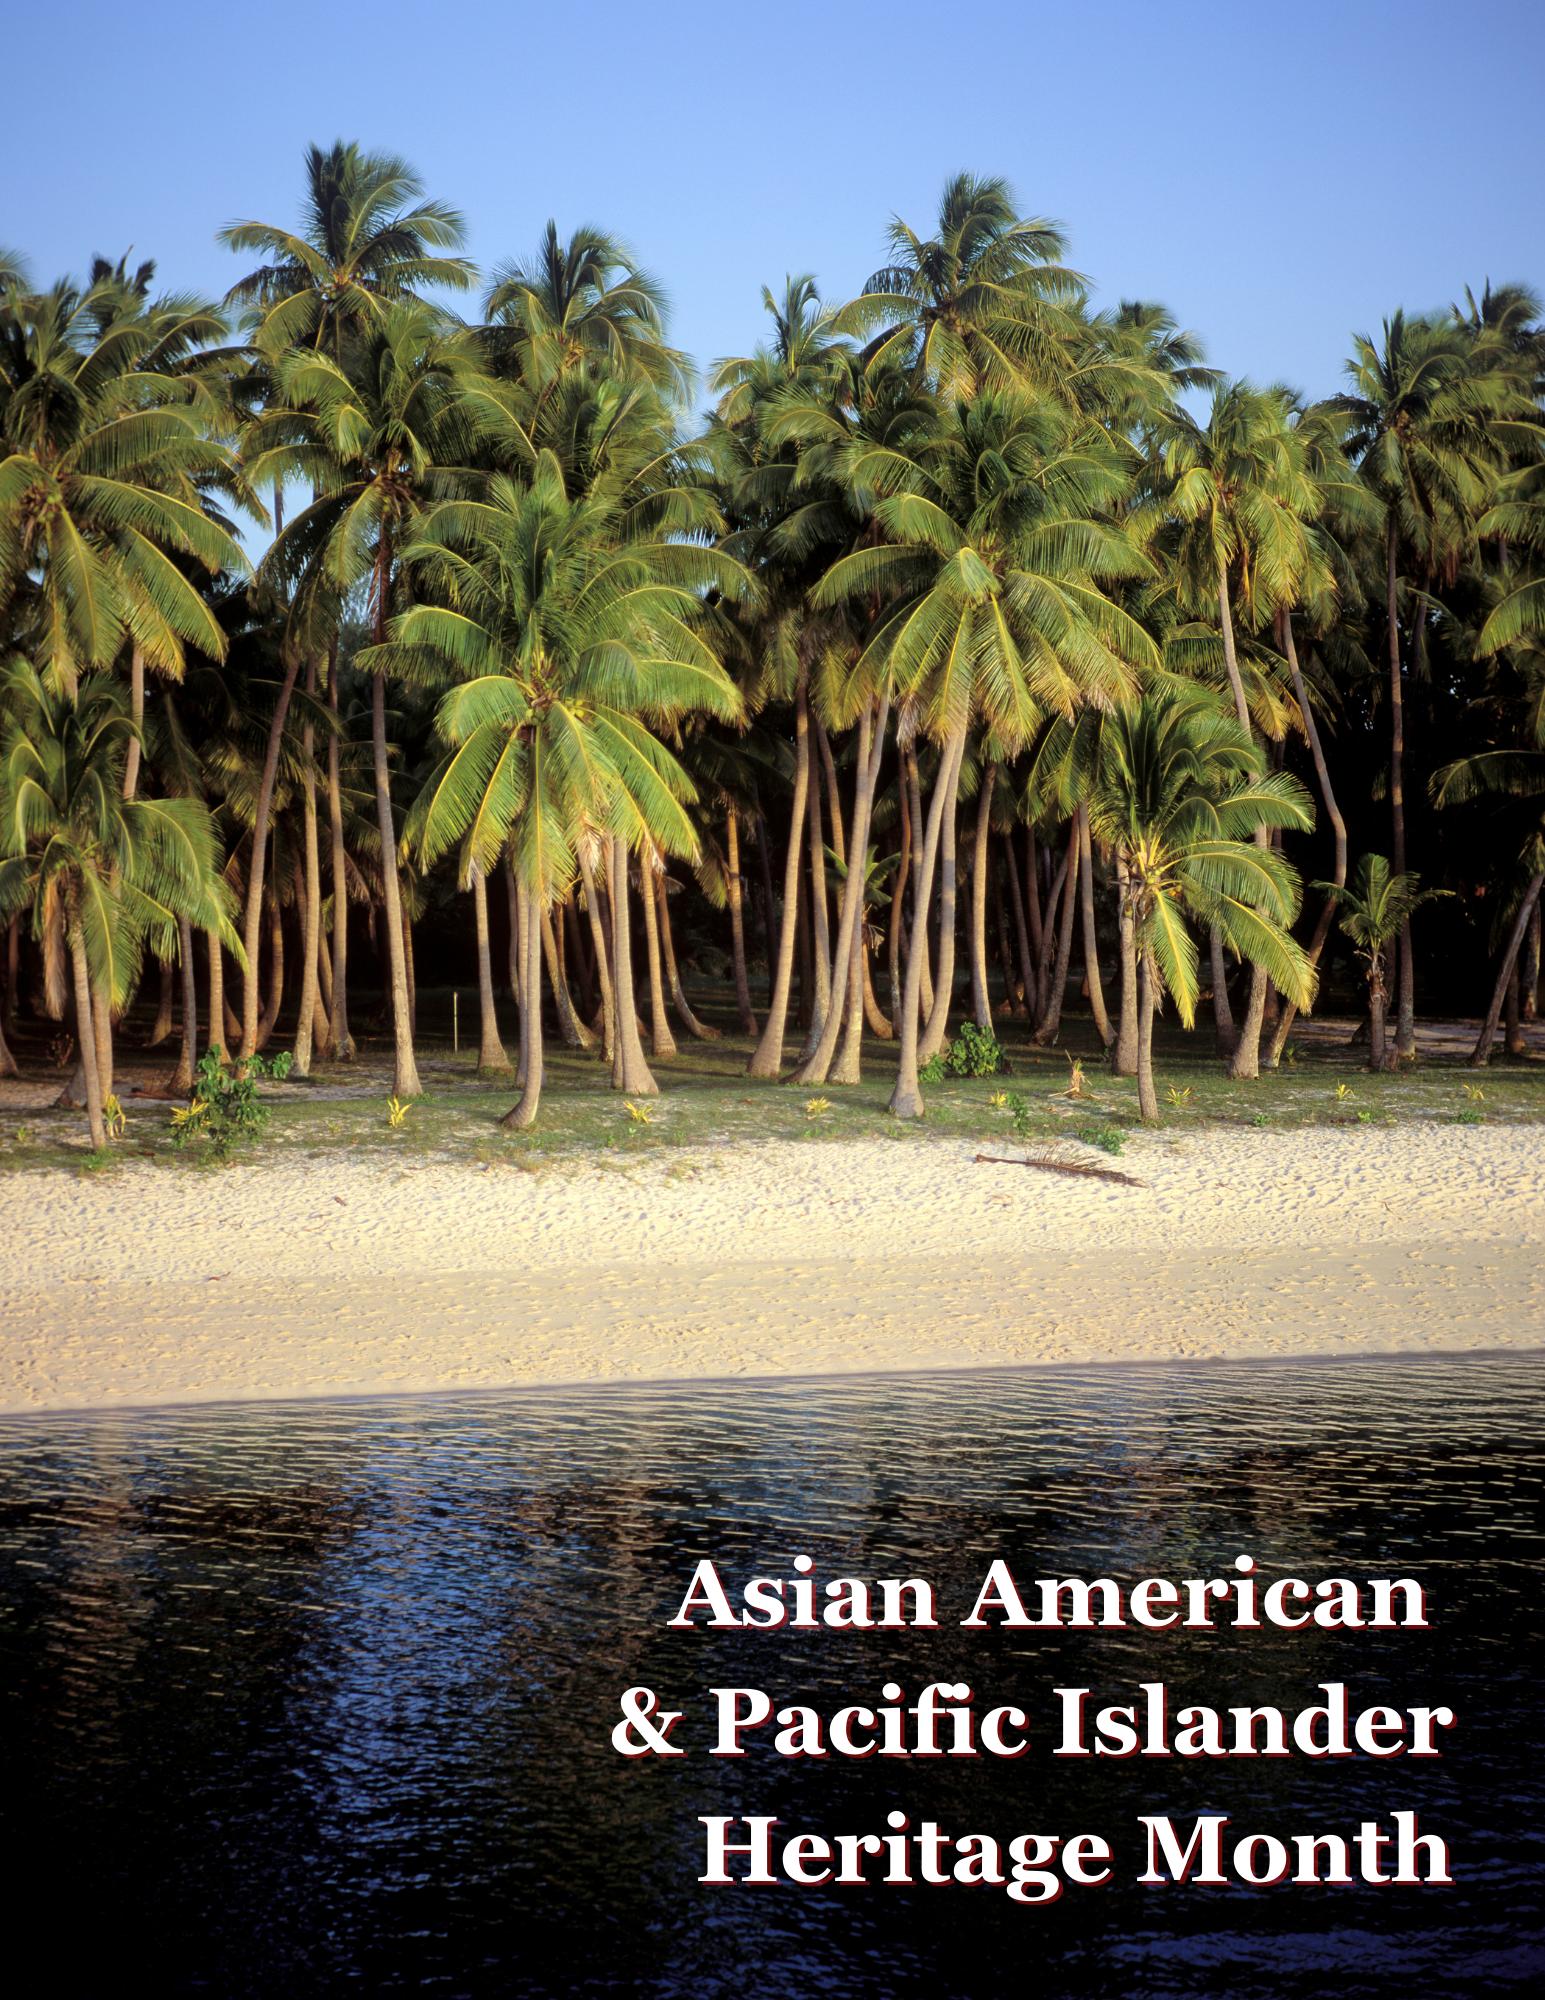 Dense palm tree forest near the shoreline of a black ocean